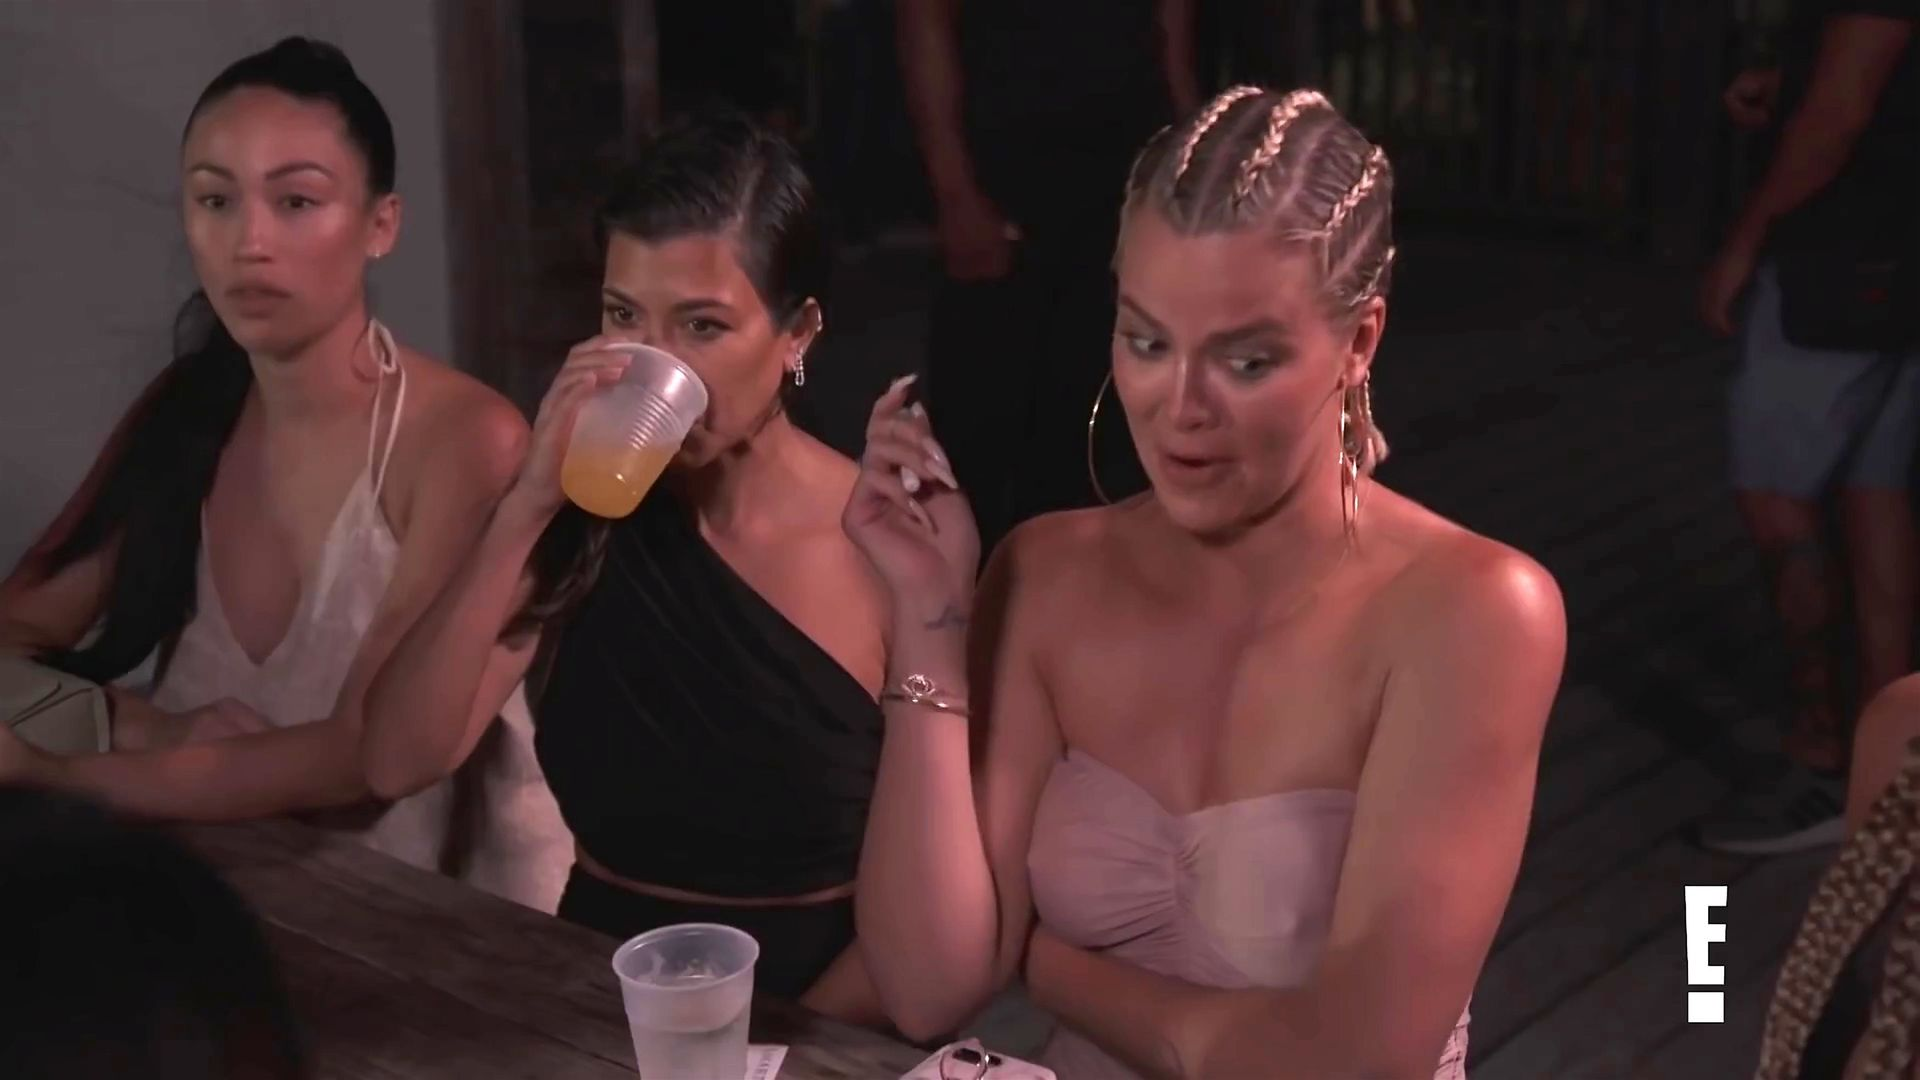 Khloé Kardashian Gets A Little Cold Without A Bra 0019